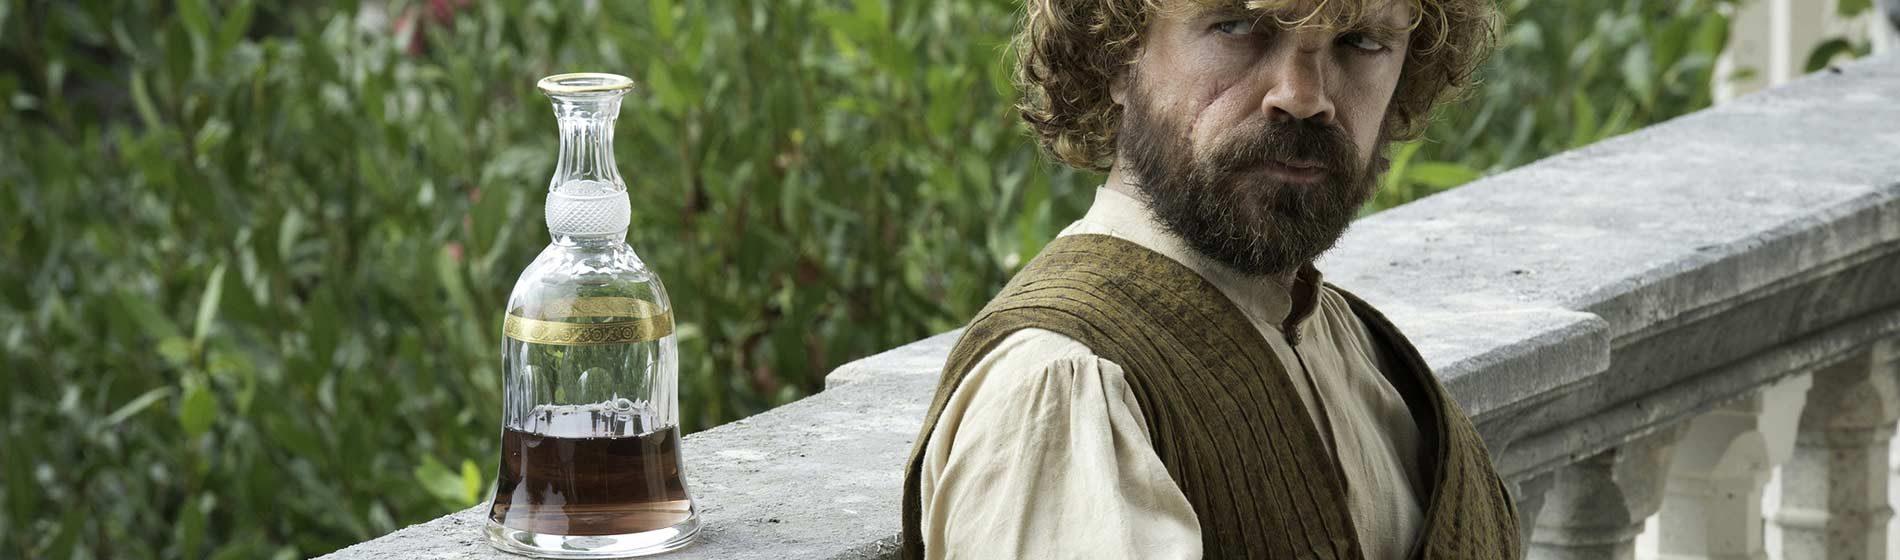 Game of Thrones - Season 5 Episode 1 - Tyrion